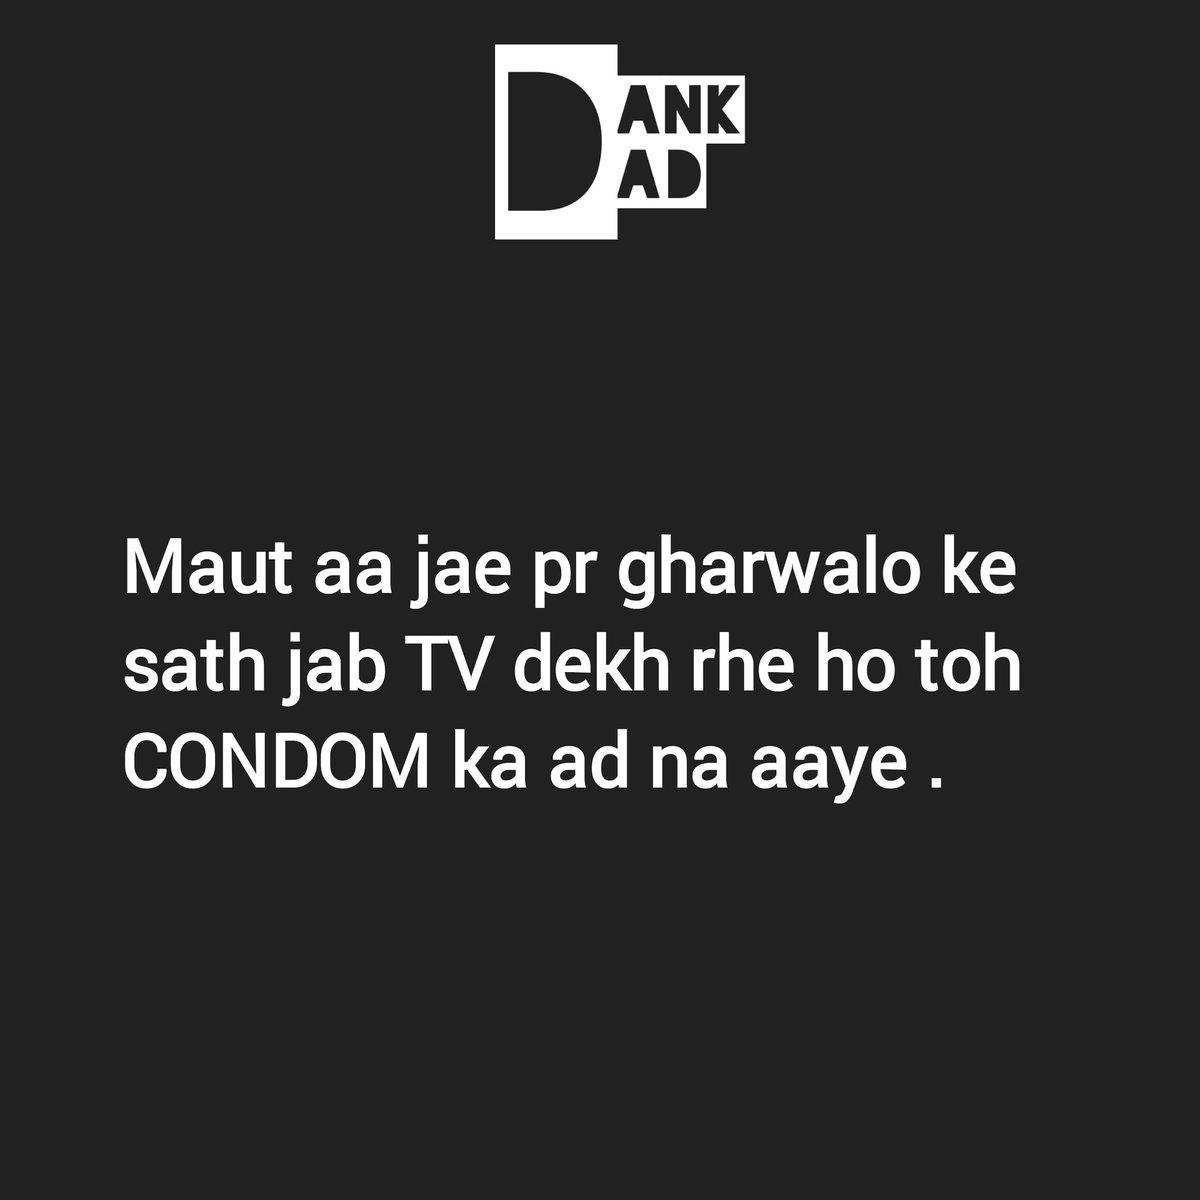 Follow @_dank_dad_ for more ....#fun #jokeoftheday #laugh  #dankjokes #nonvegjokes #follow #funny #jokes #sarcasm #FF #likes #comedyindia #backchodi #sacredmemes #bollywoodpic.twitter.com/ZEk8qHouLU